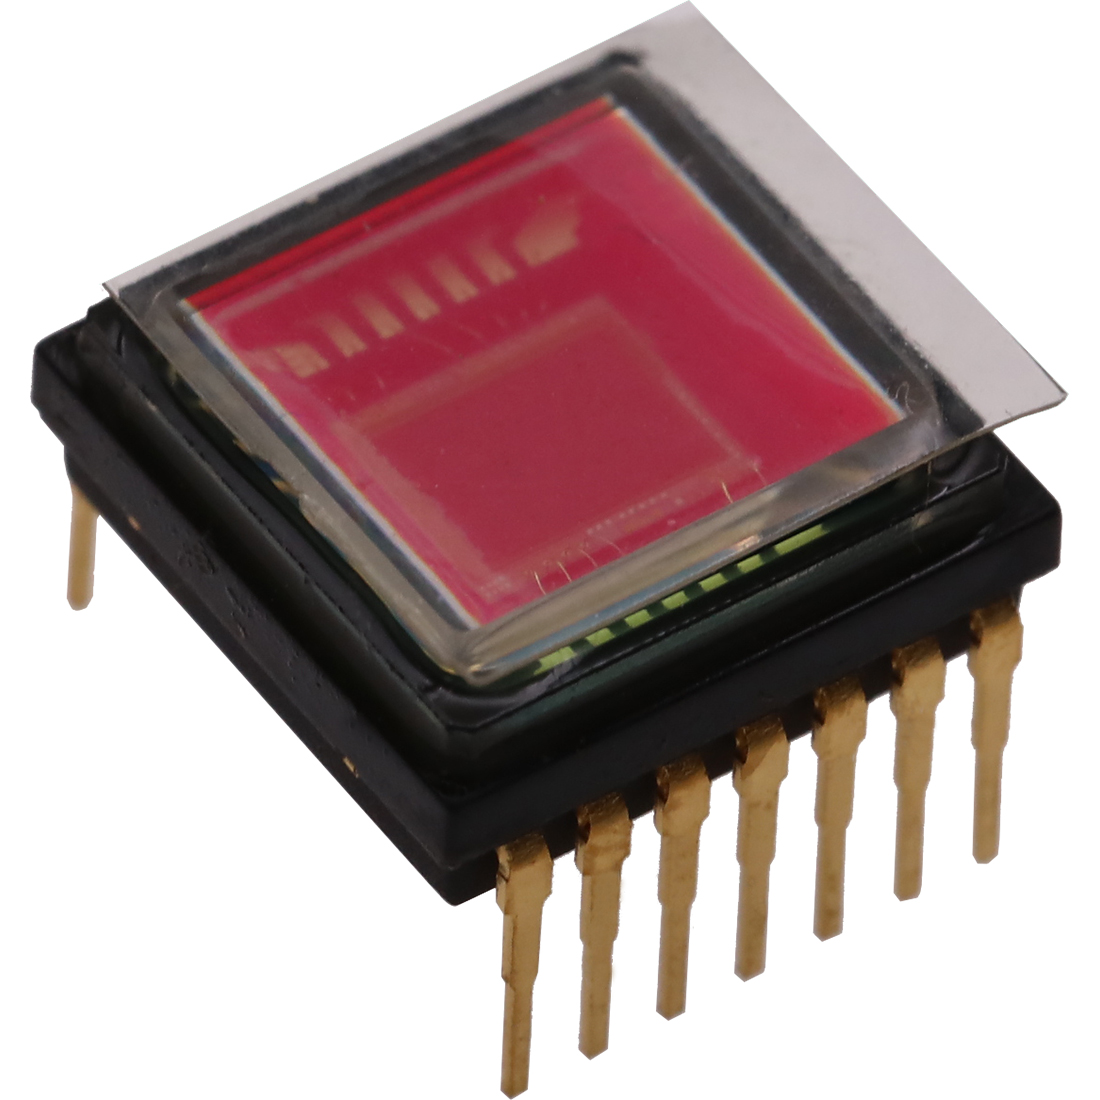 RJ2451AA0PB,SHARP CCD SENSOR FOR SECURITY CAMERA ,高解析度安防CCD,监控NTSC CCD,480TV LINE CCD,分辨率768X494,PIXEL SIZE:4.9X5.6μm,COLOR,1/4-inch charp CCD